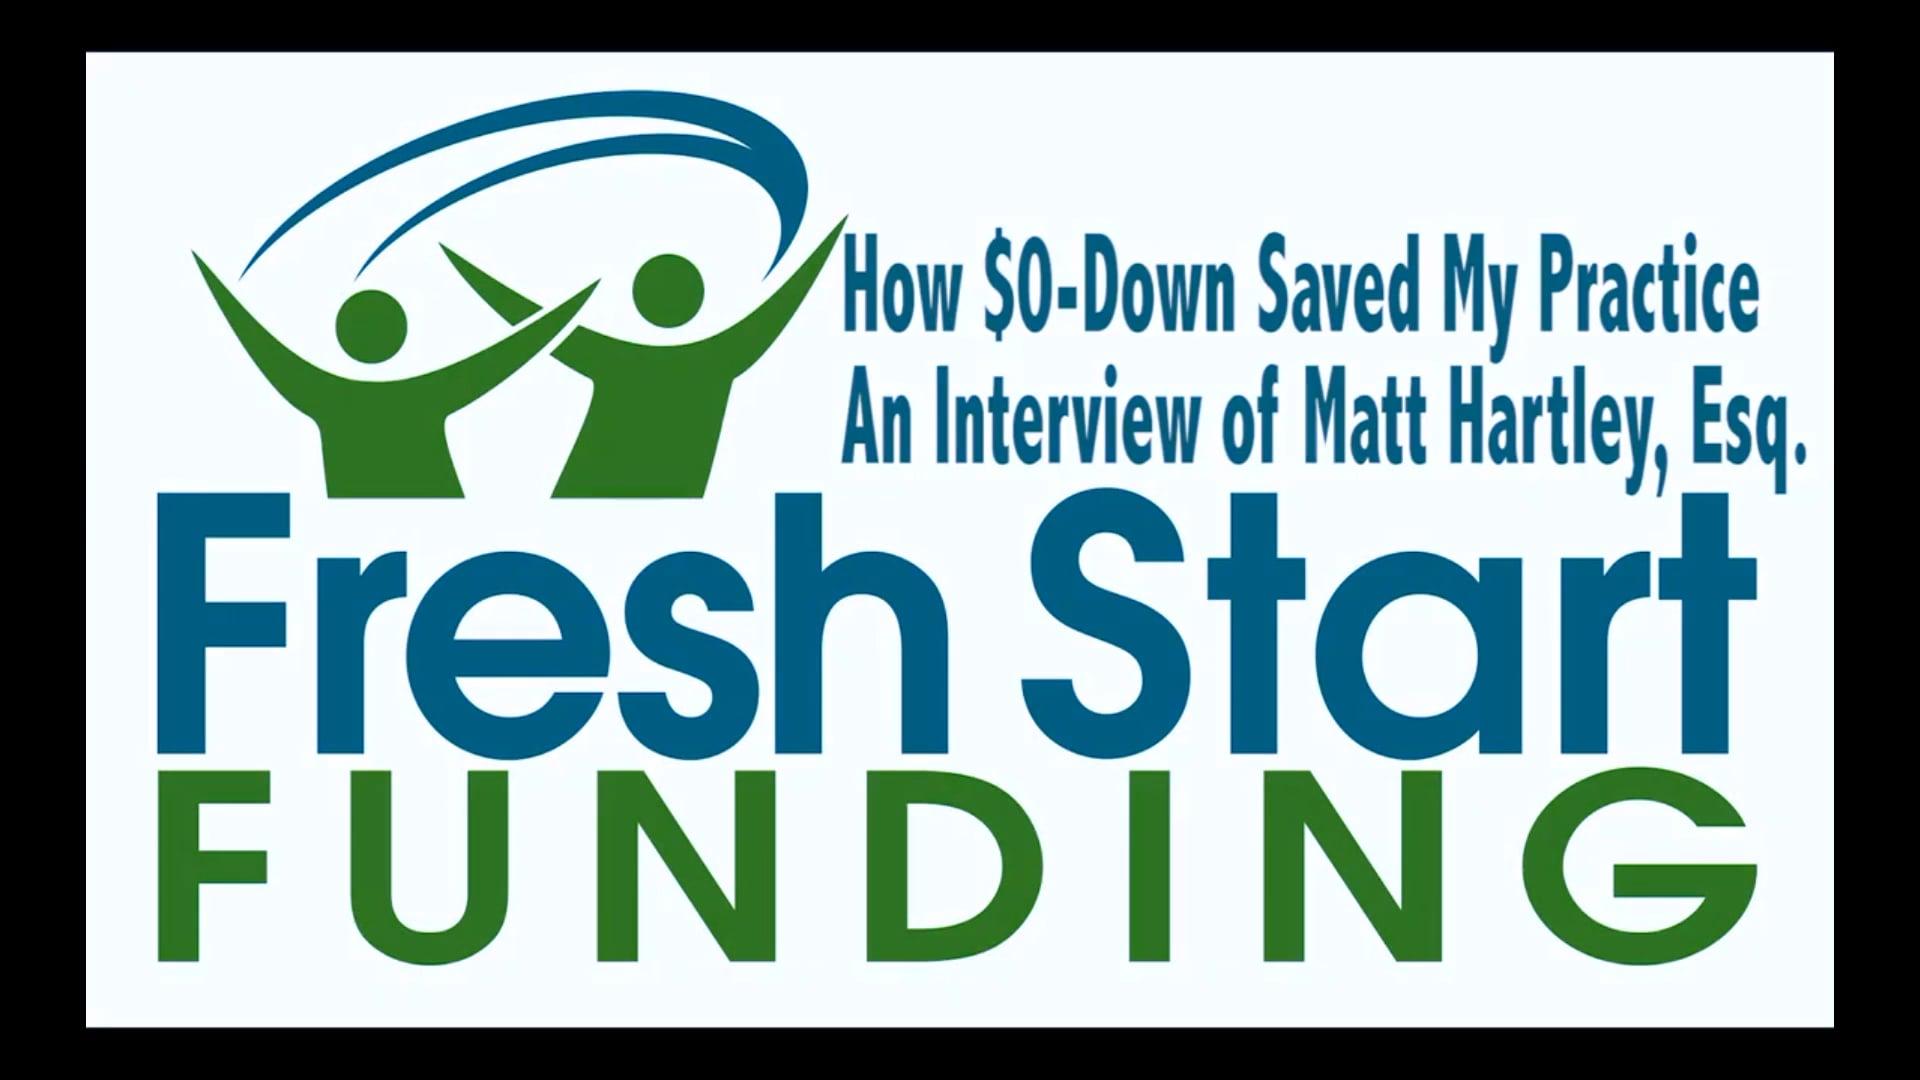 How $0-Down Saved My Practice - Interview of Matt Hartley, Esq.